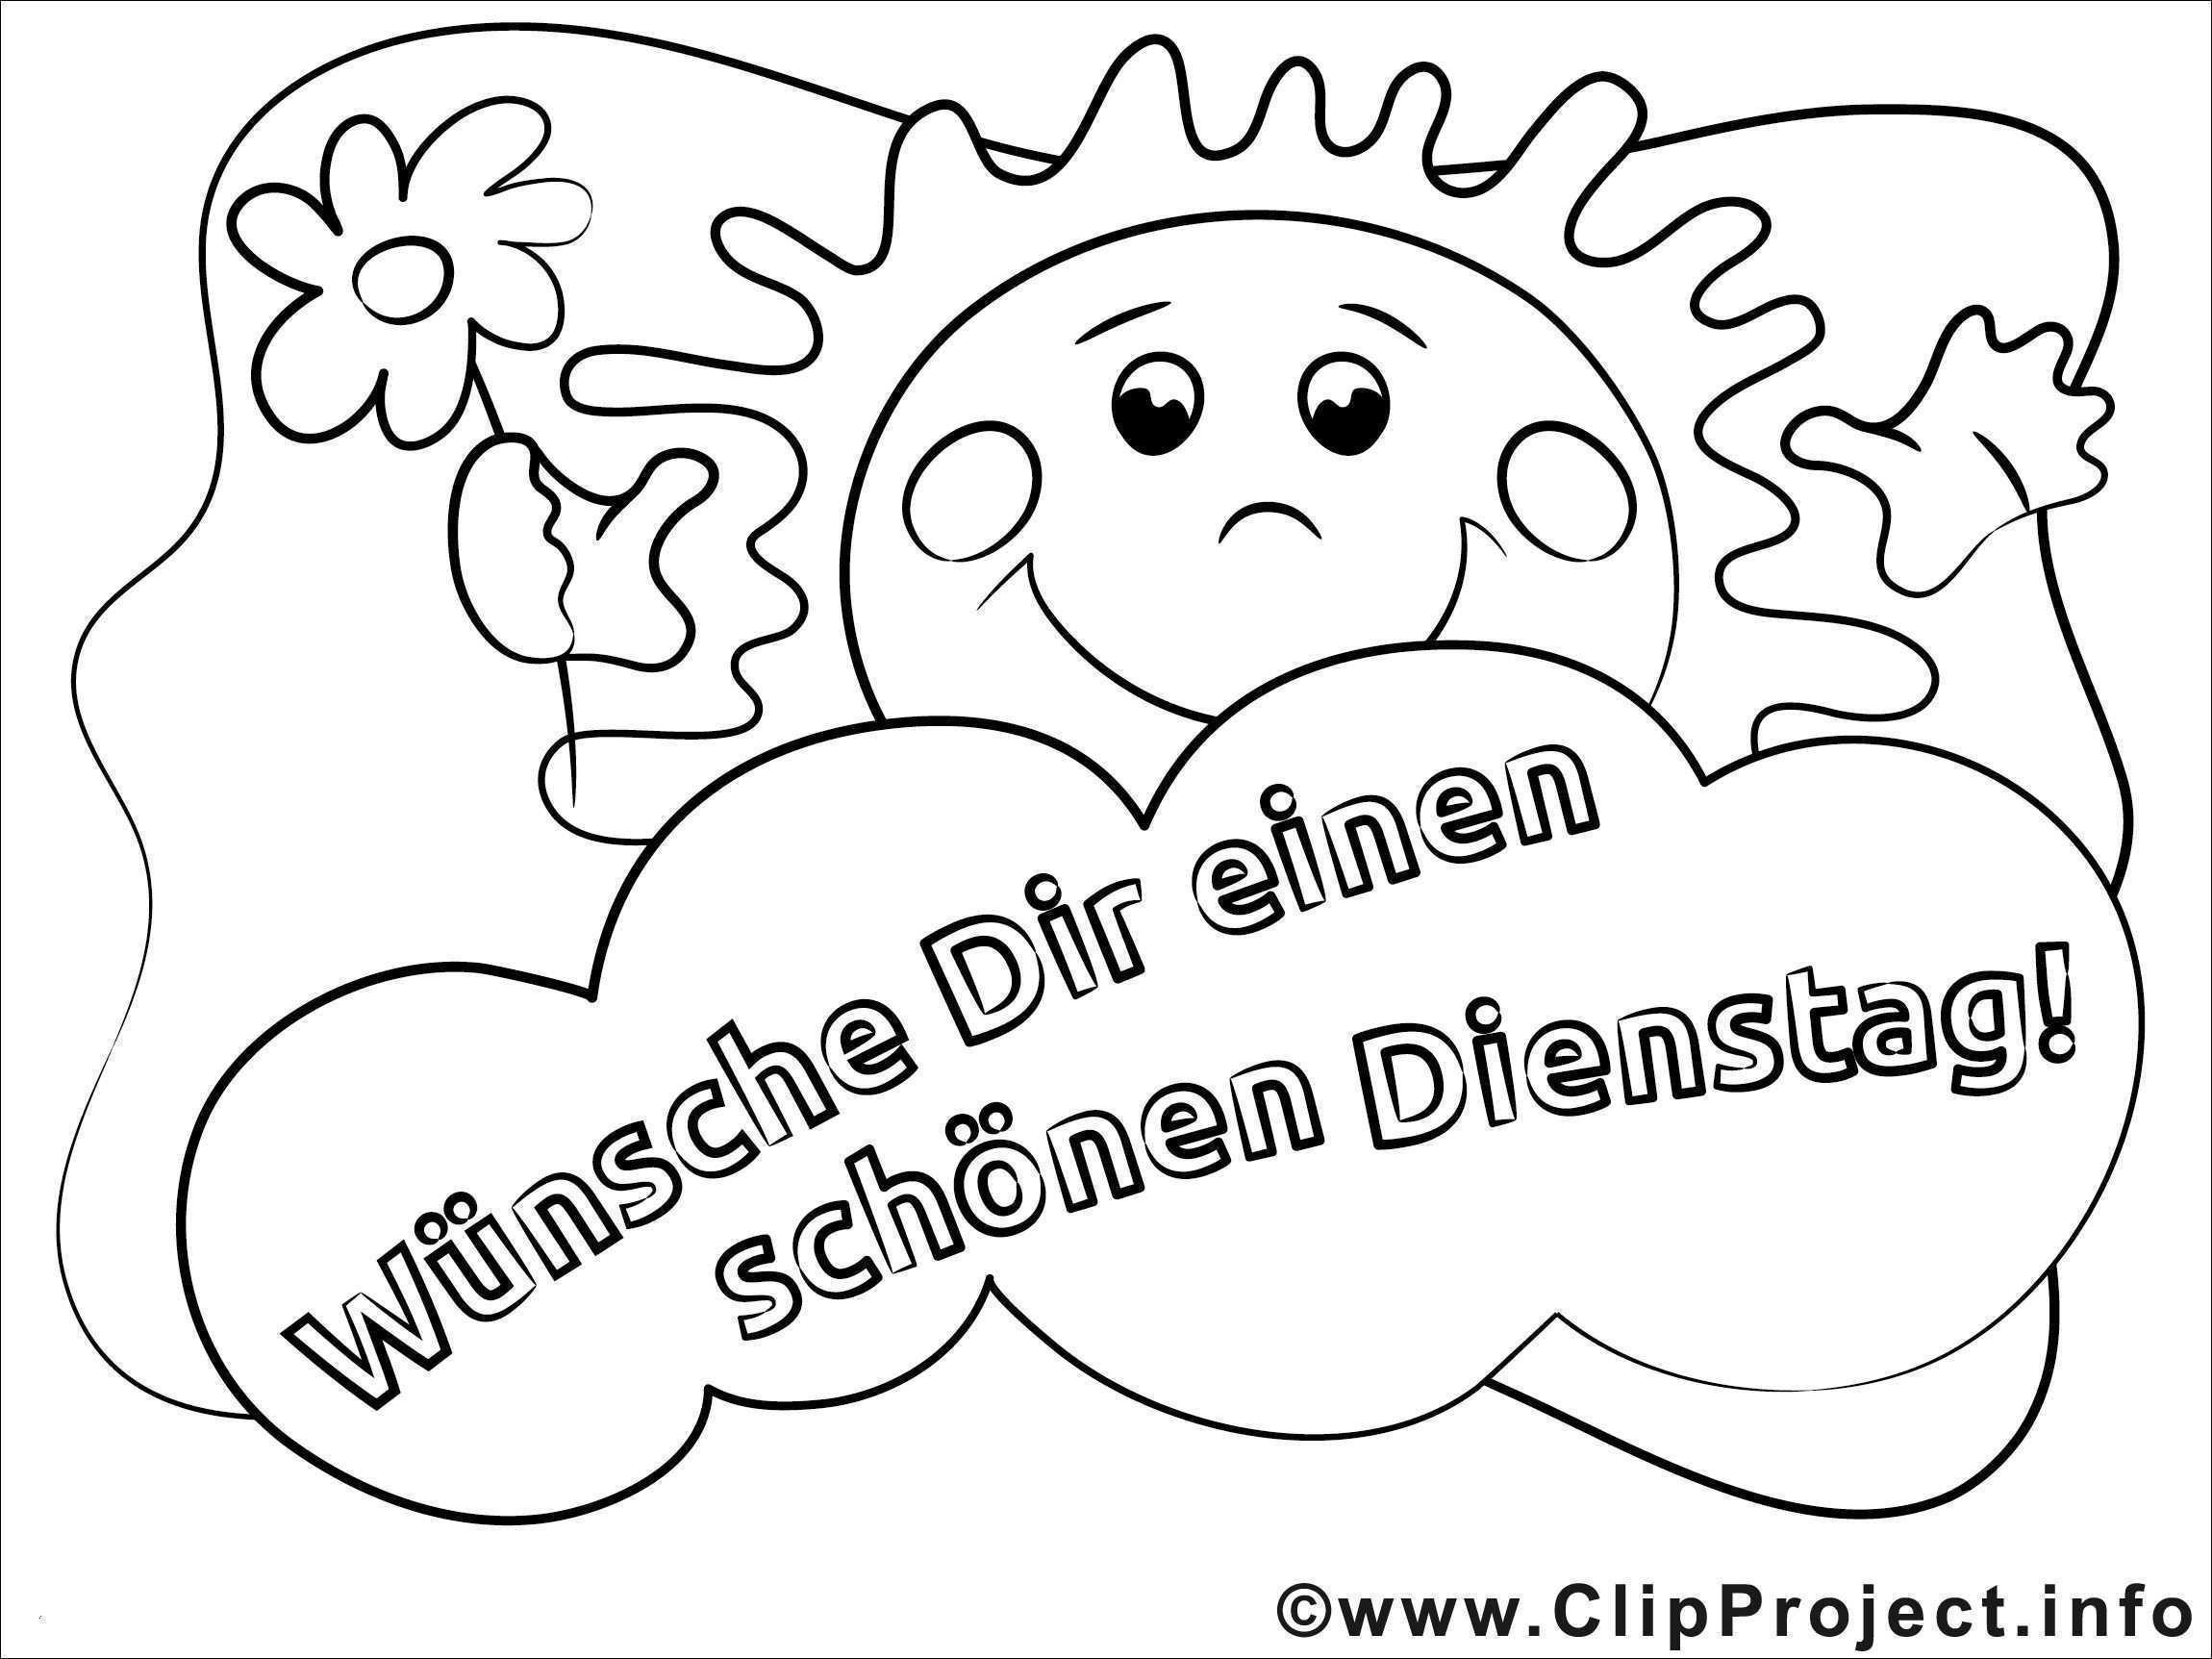 Olaf Ausmalbilder Zum Ausdrucken Genial Olaf Der Schneemann Ausmalbilder Fotos Ausmalbilder Halloween Bild